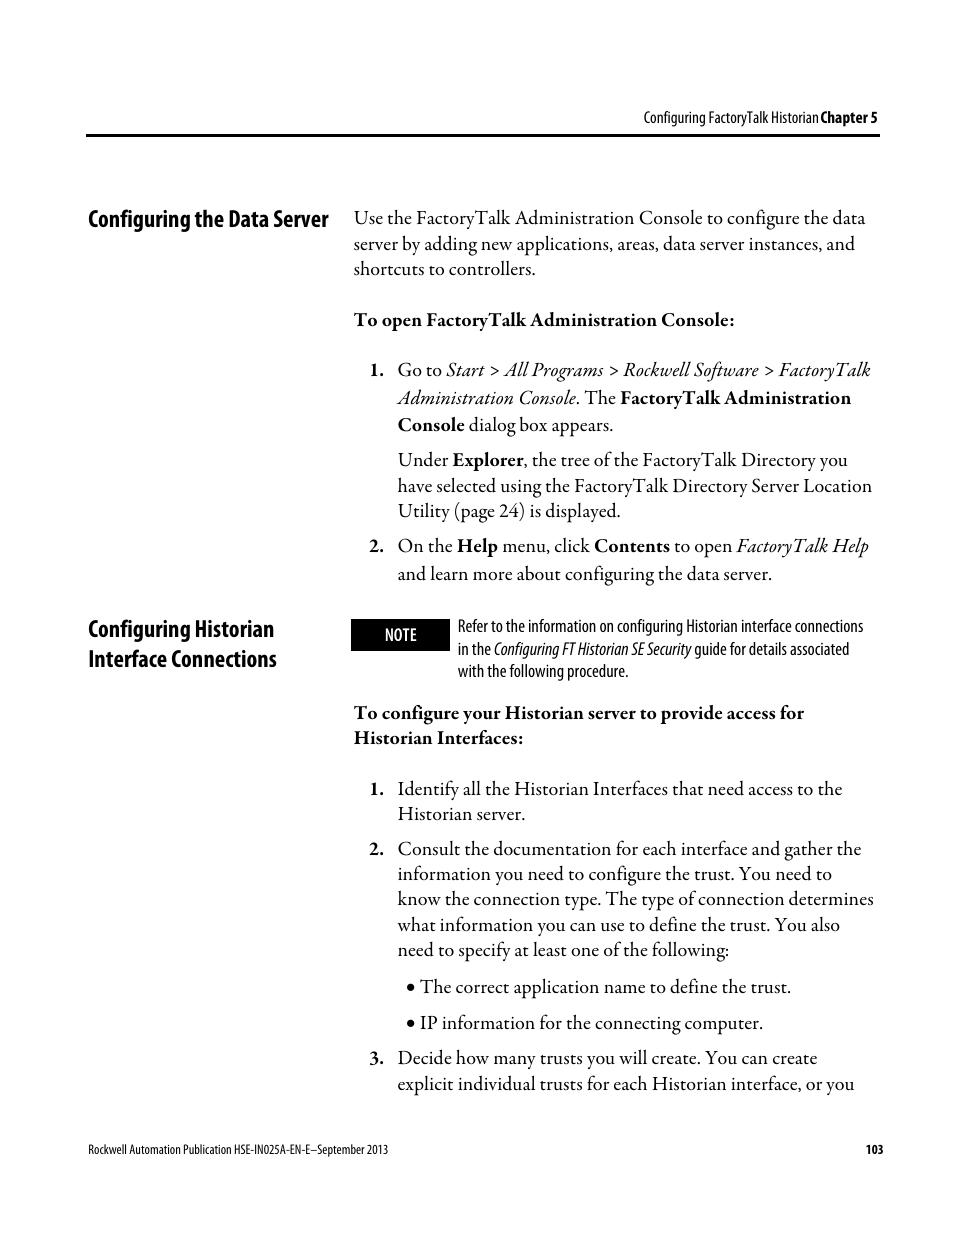 Configuring the data server, Configuring historian interface